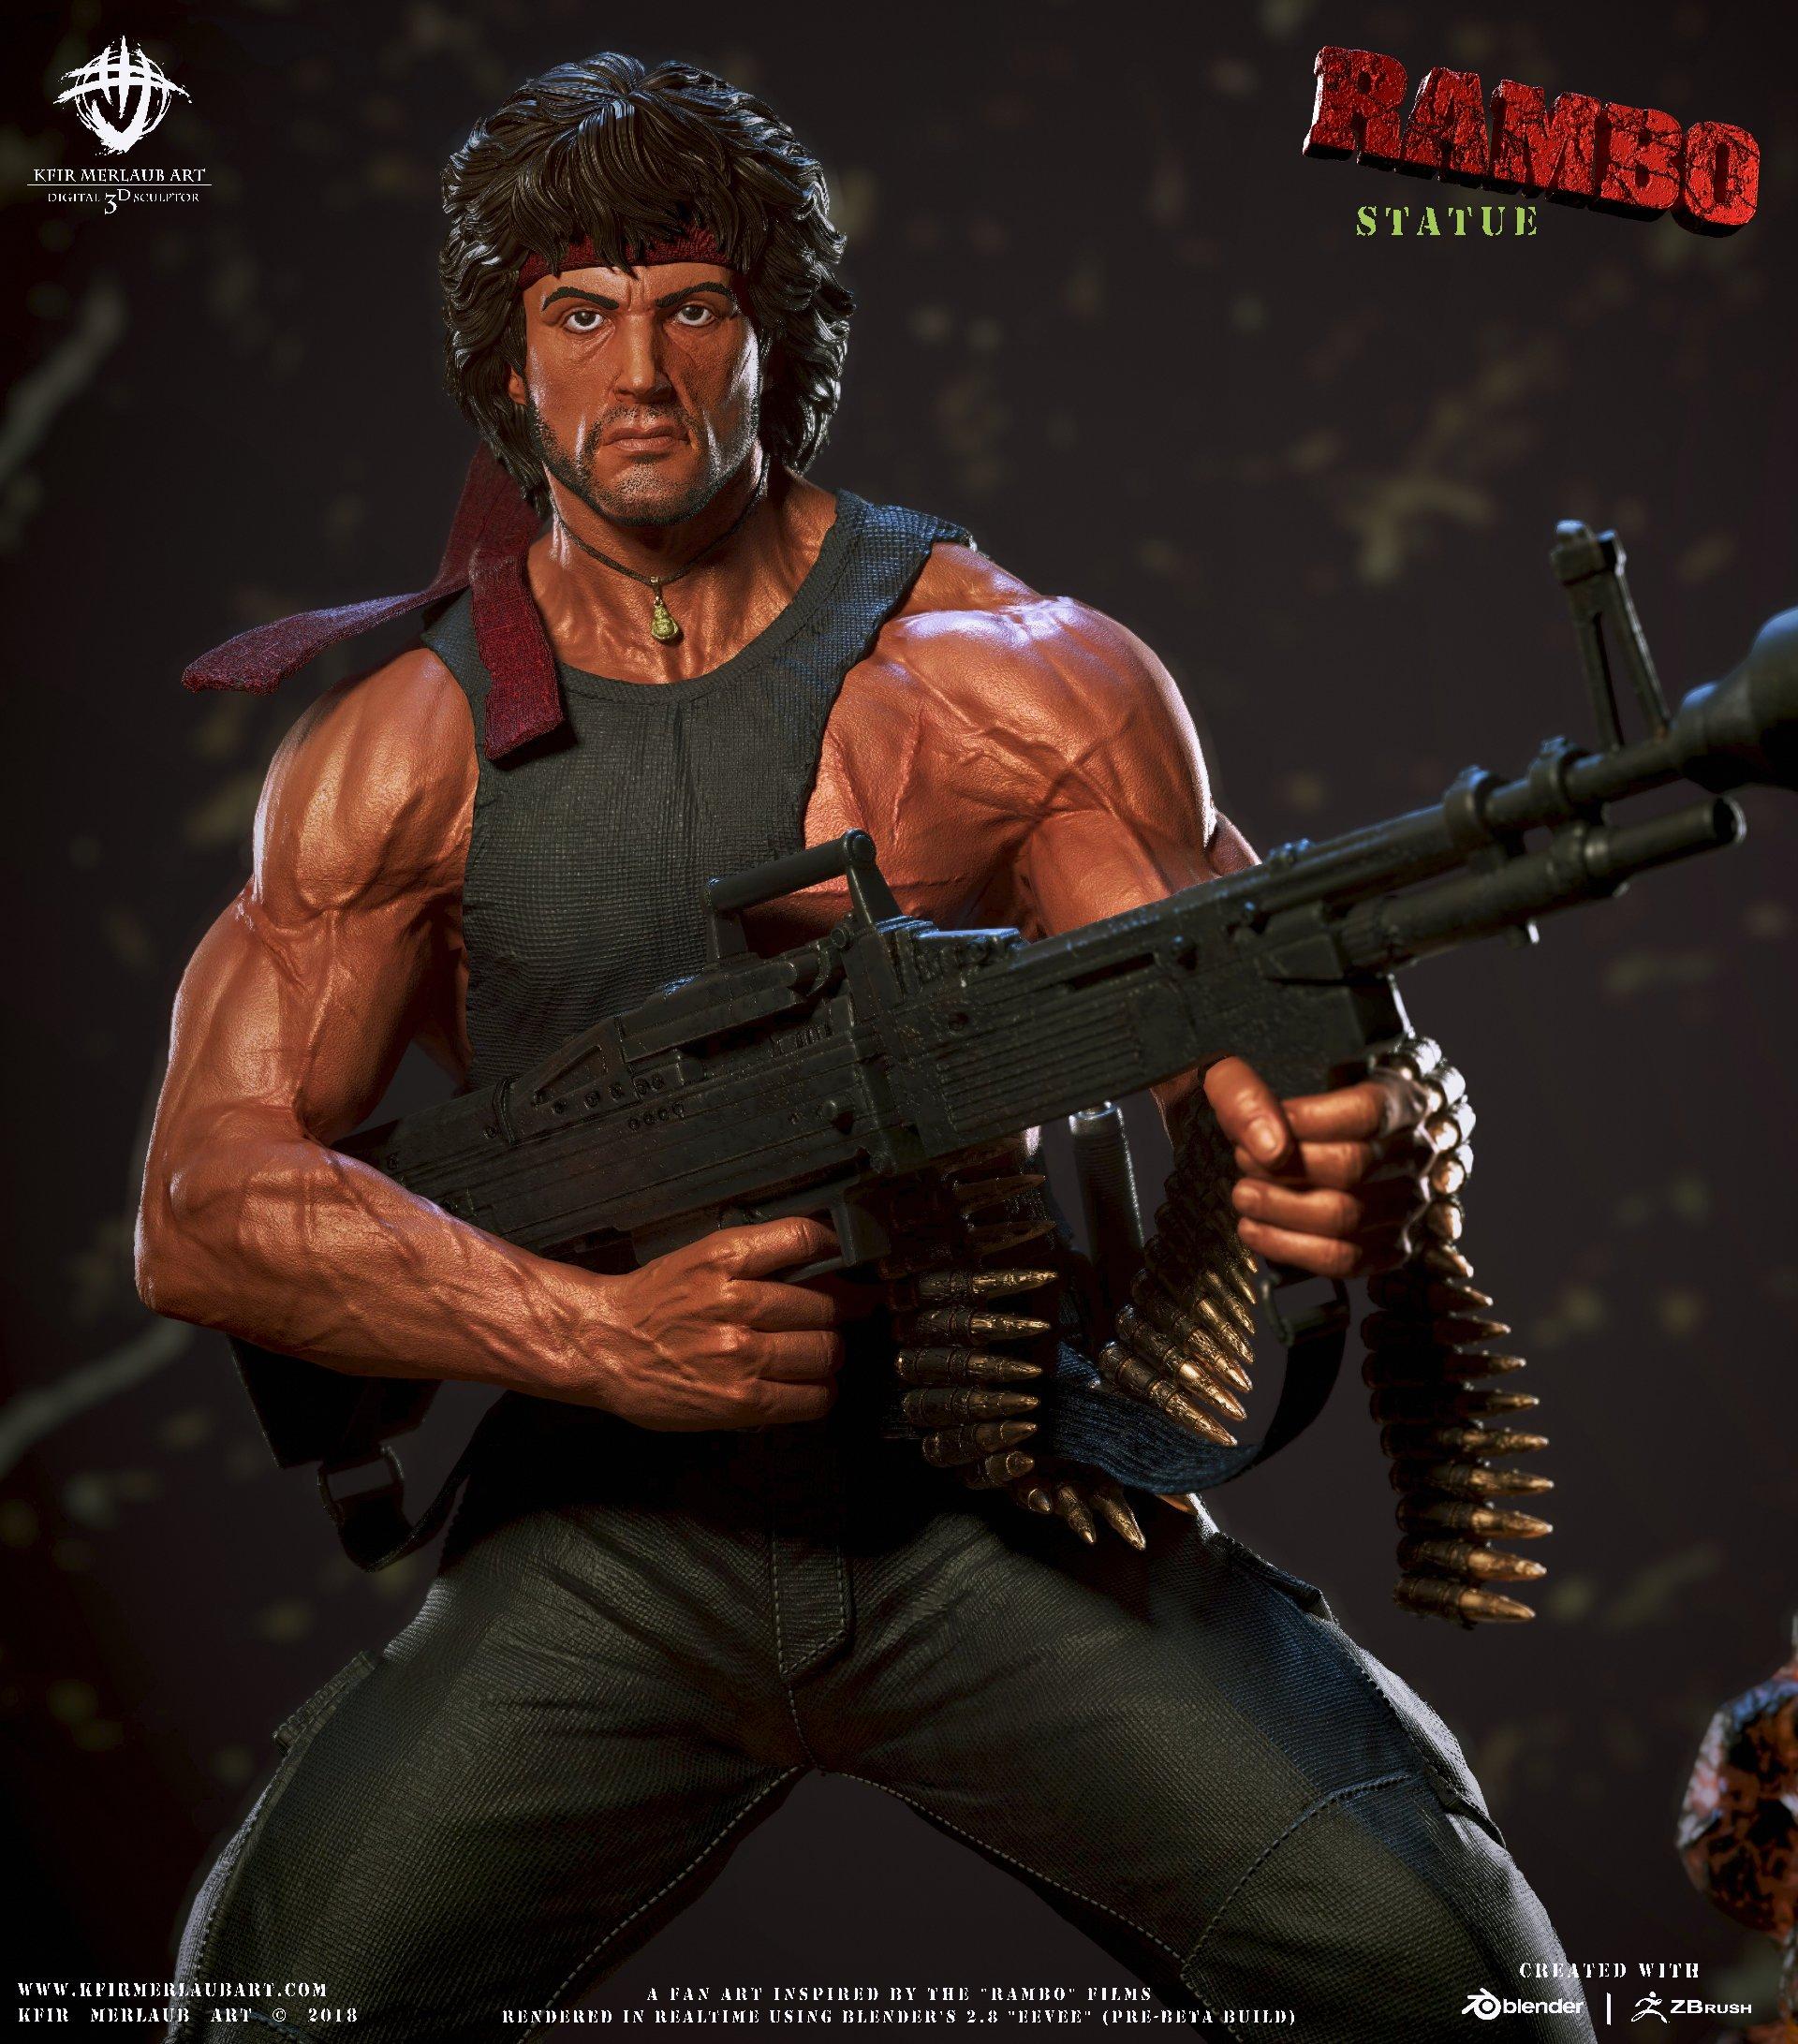 Rambo Statue   Kfir Me...